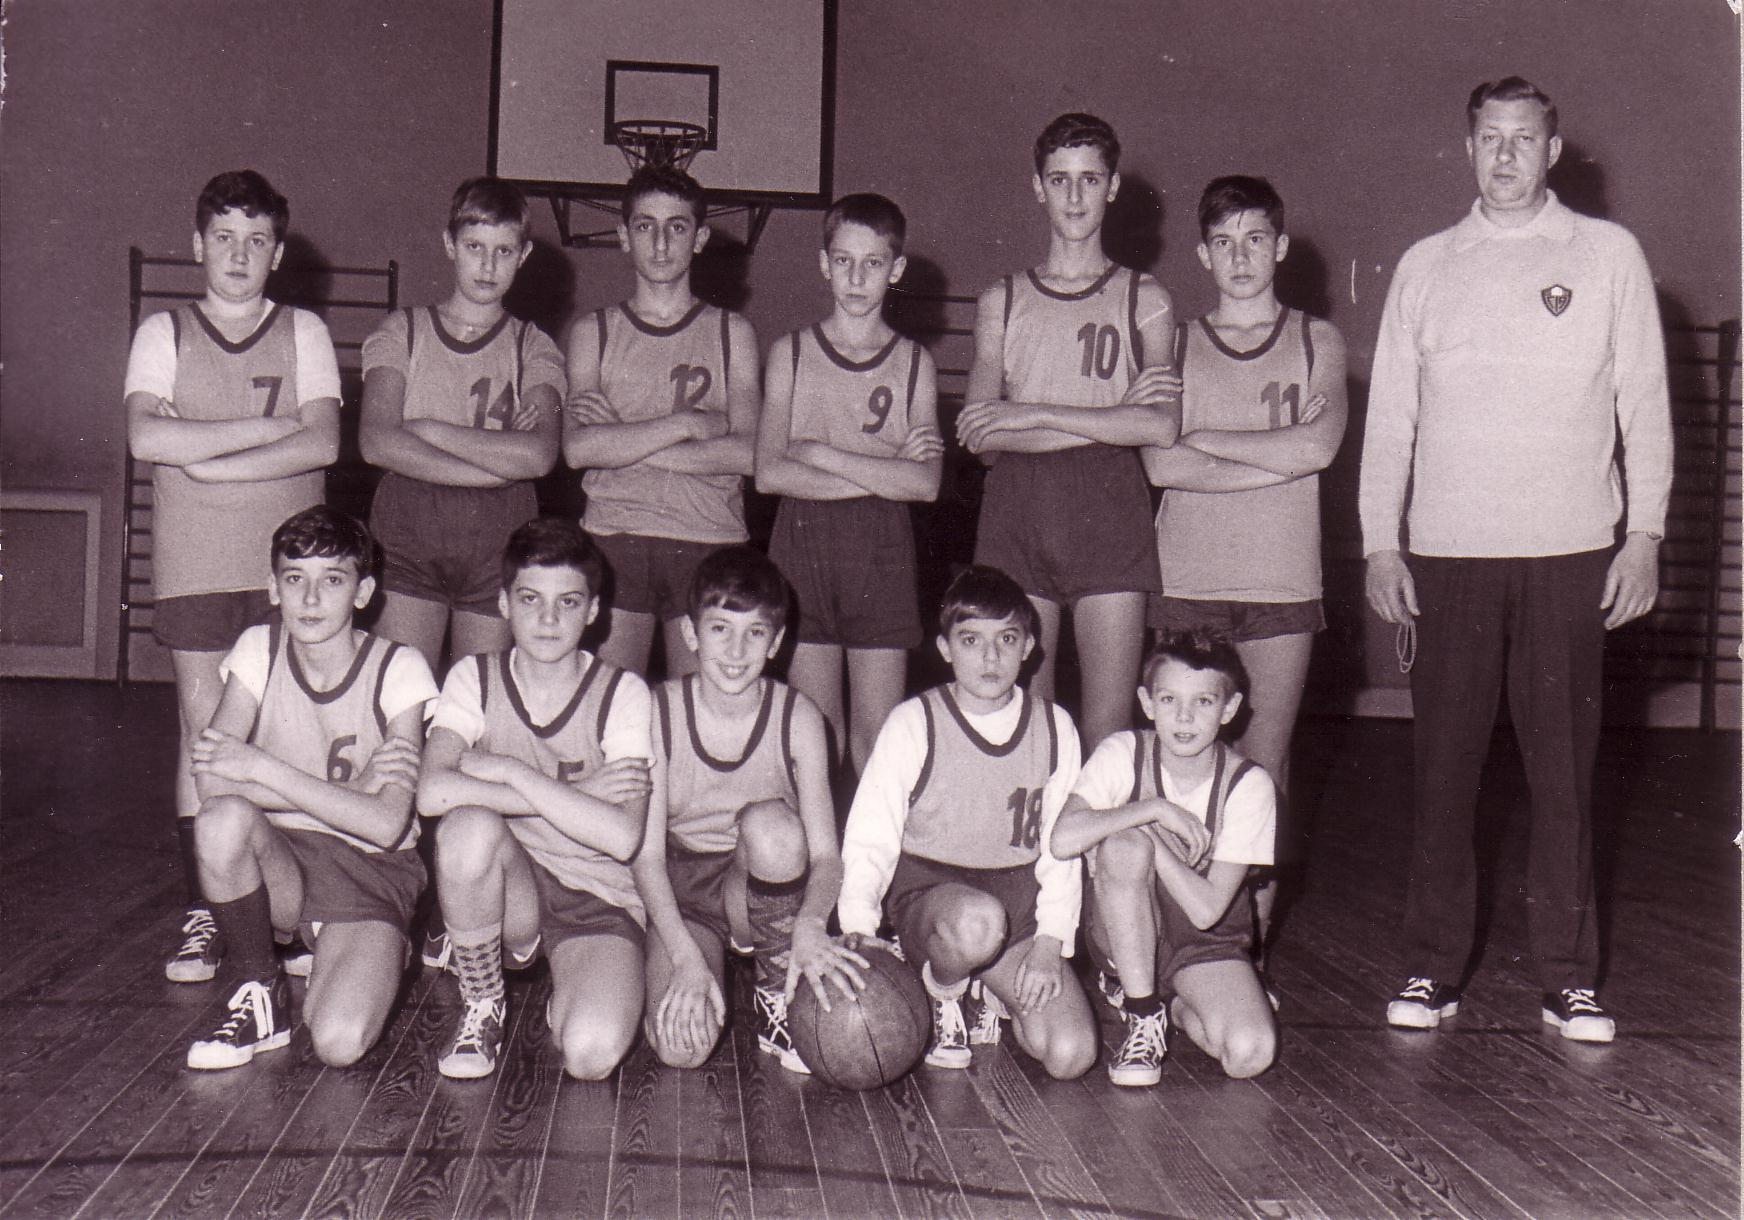 camp-to-ragazzi-1965-1966